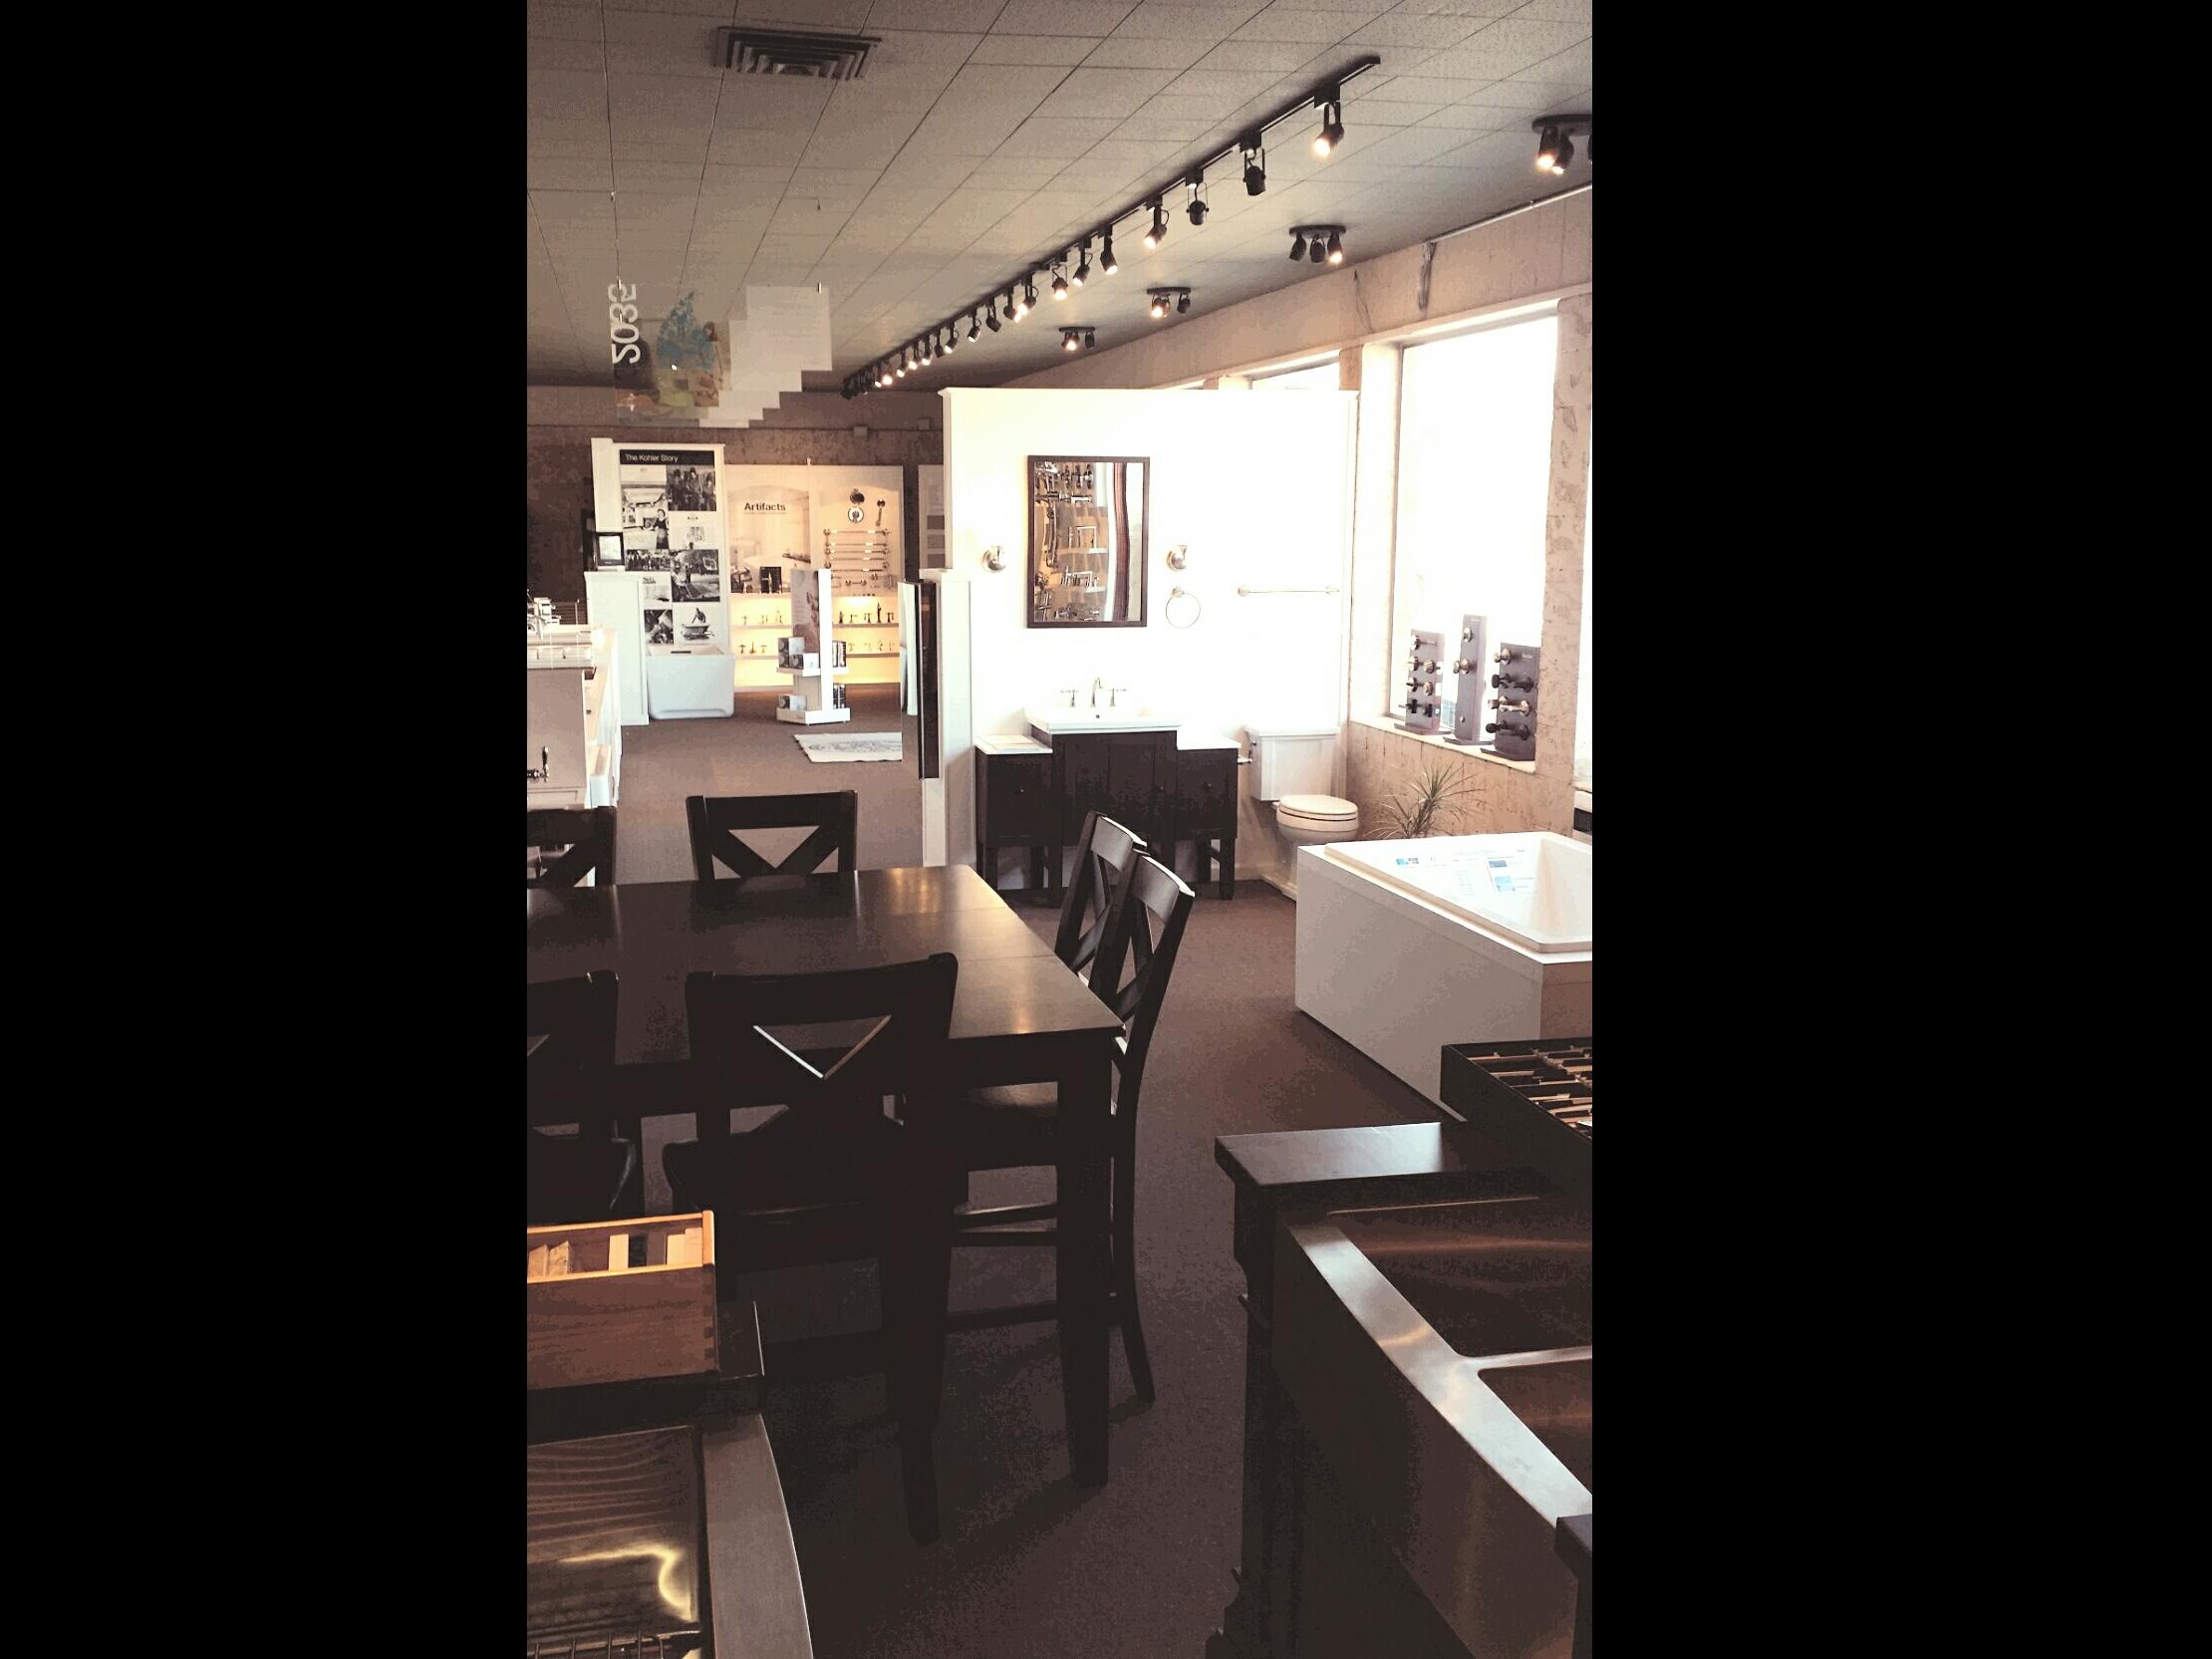 Hajoca's Kitchen & Bath Design Center